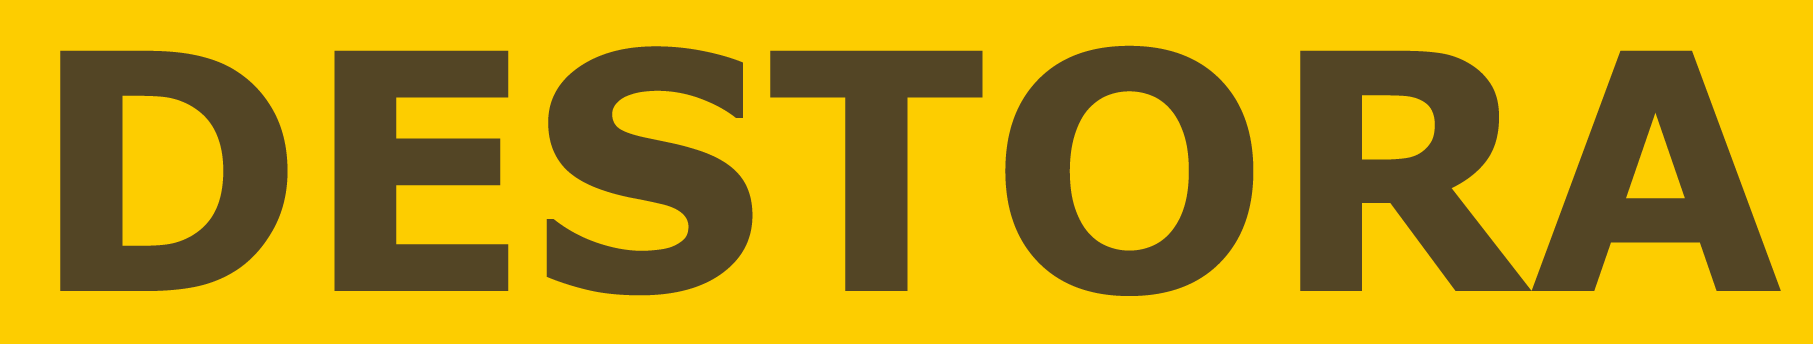 DesTora